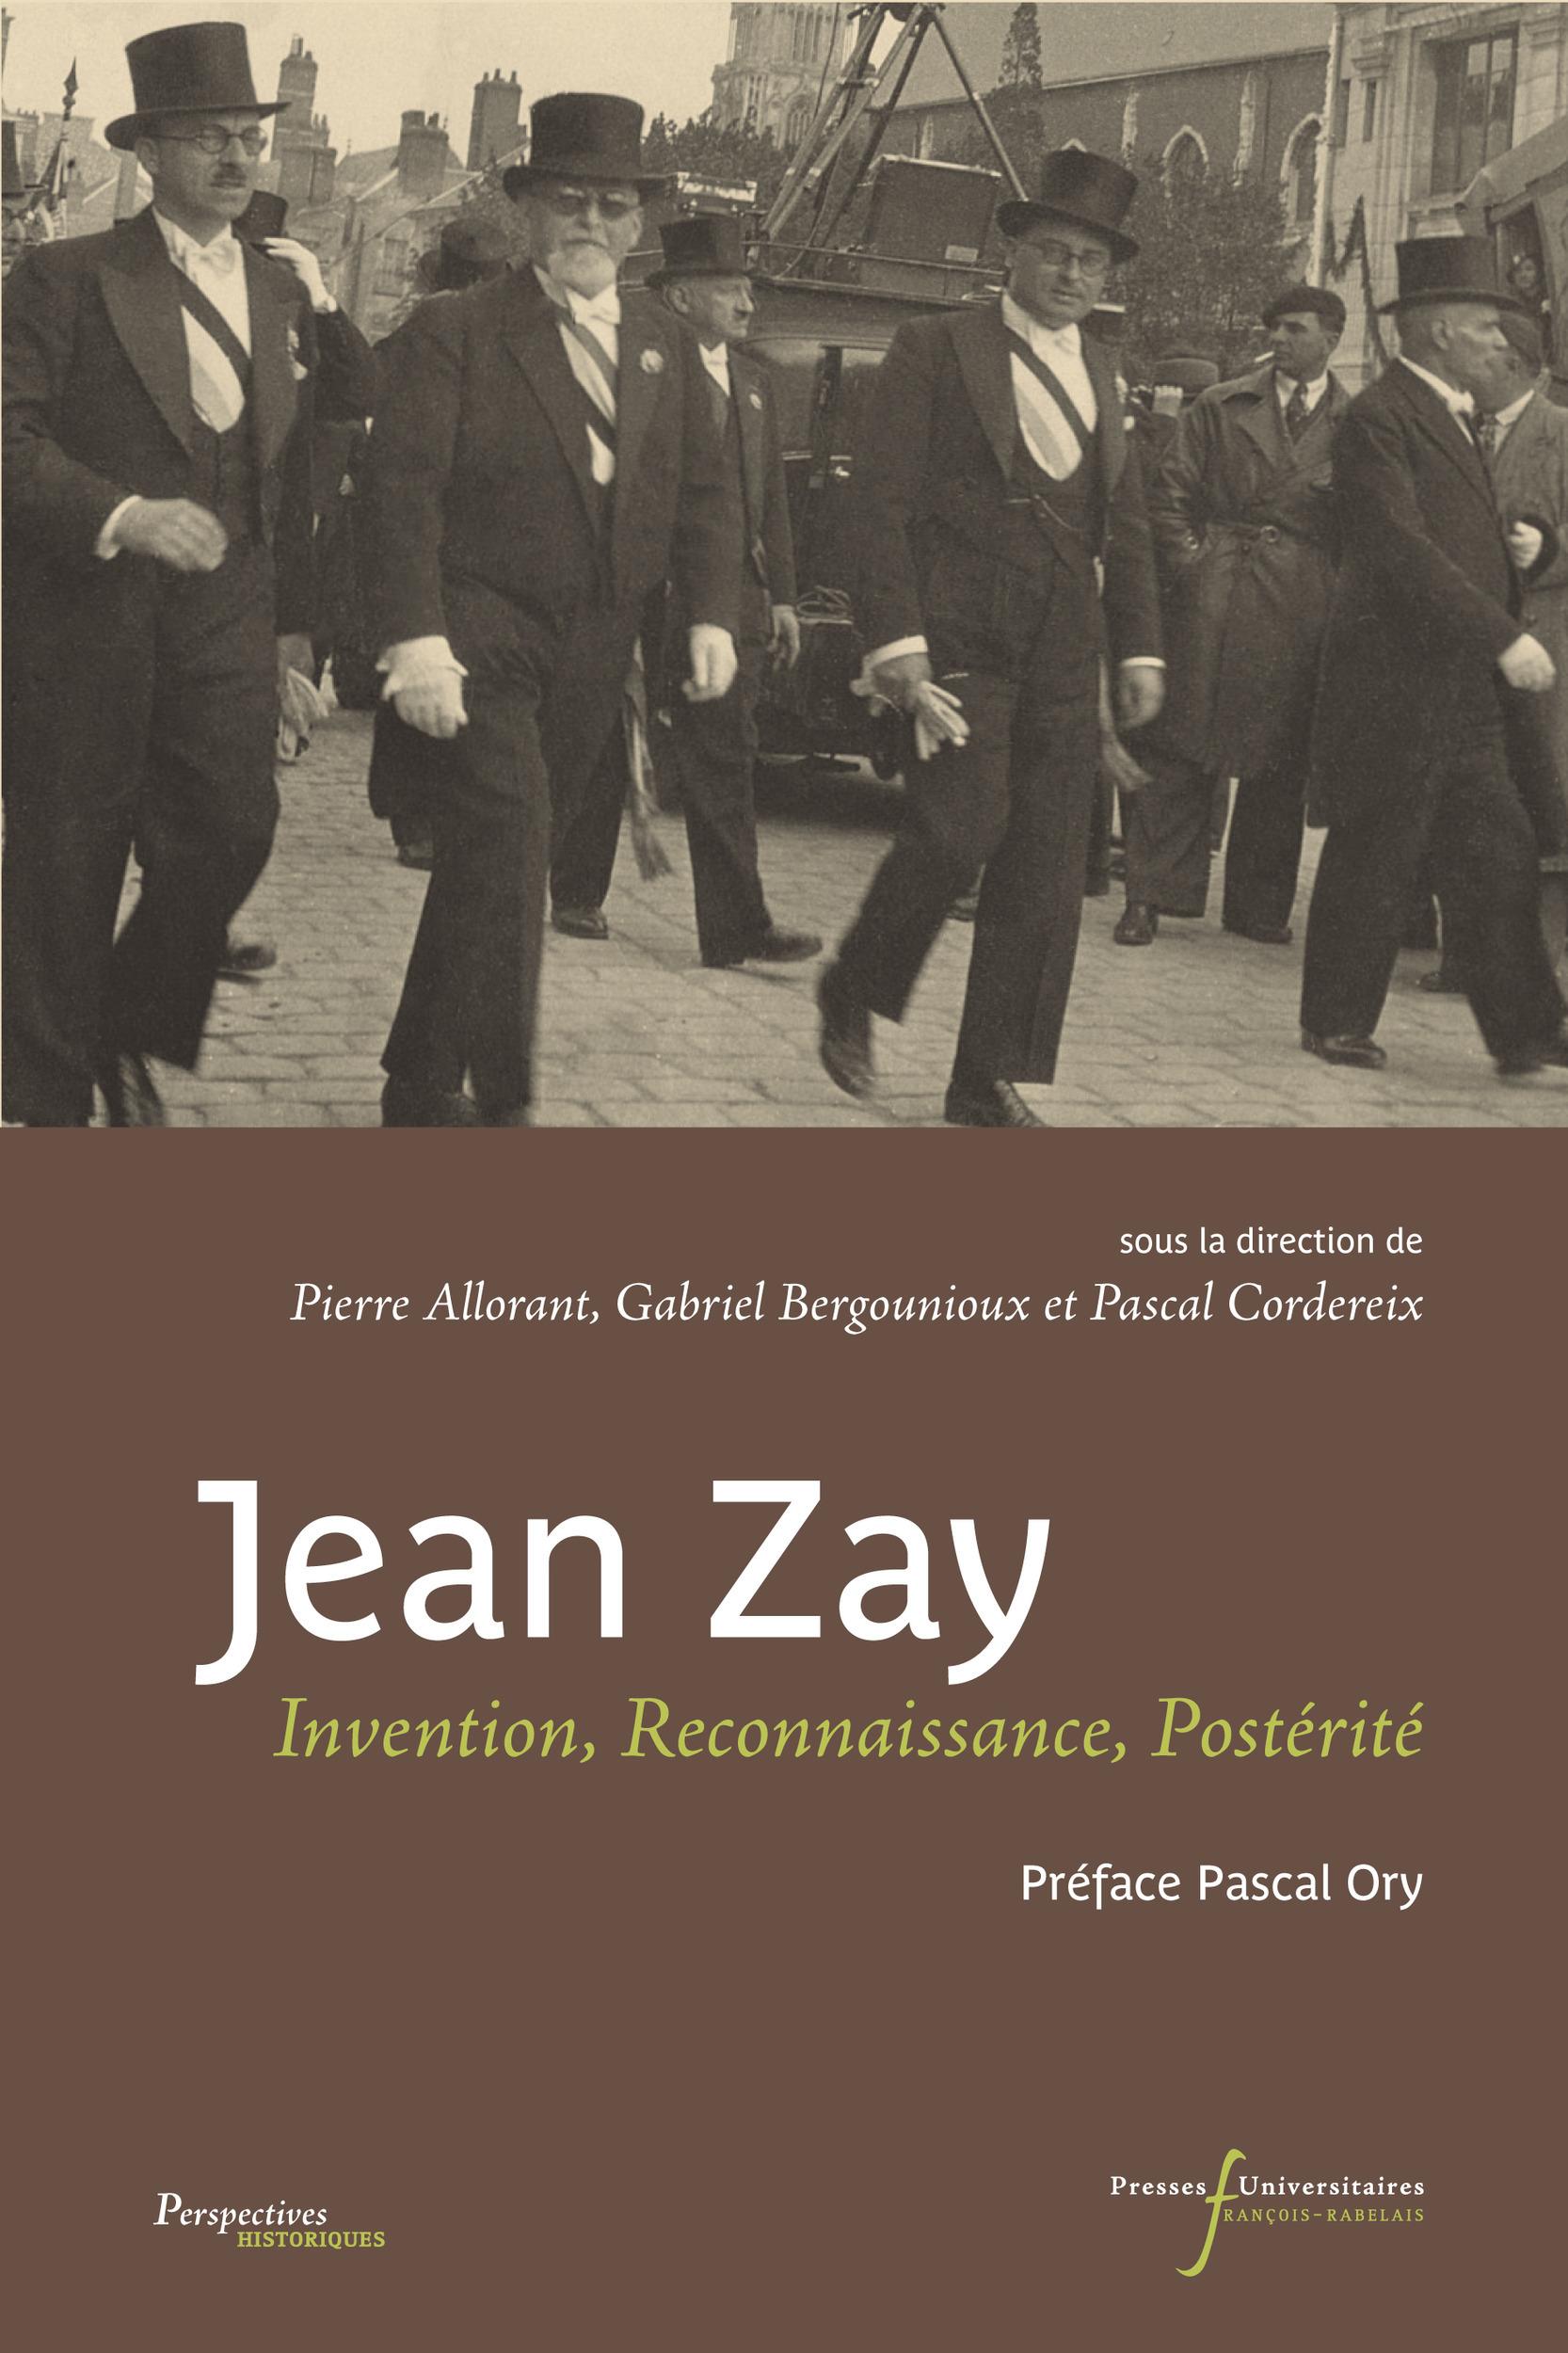 Jean zay - invention,reconnaissance, posterite